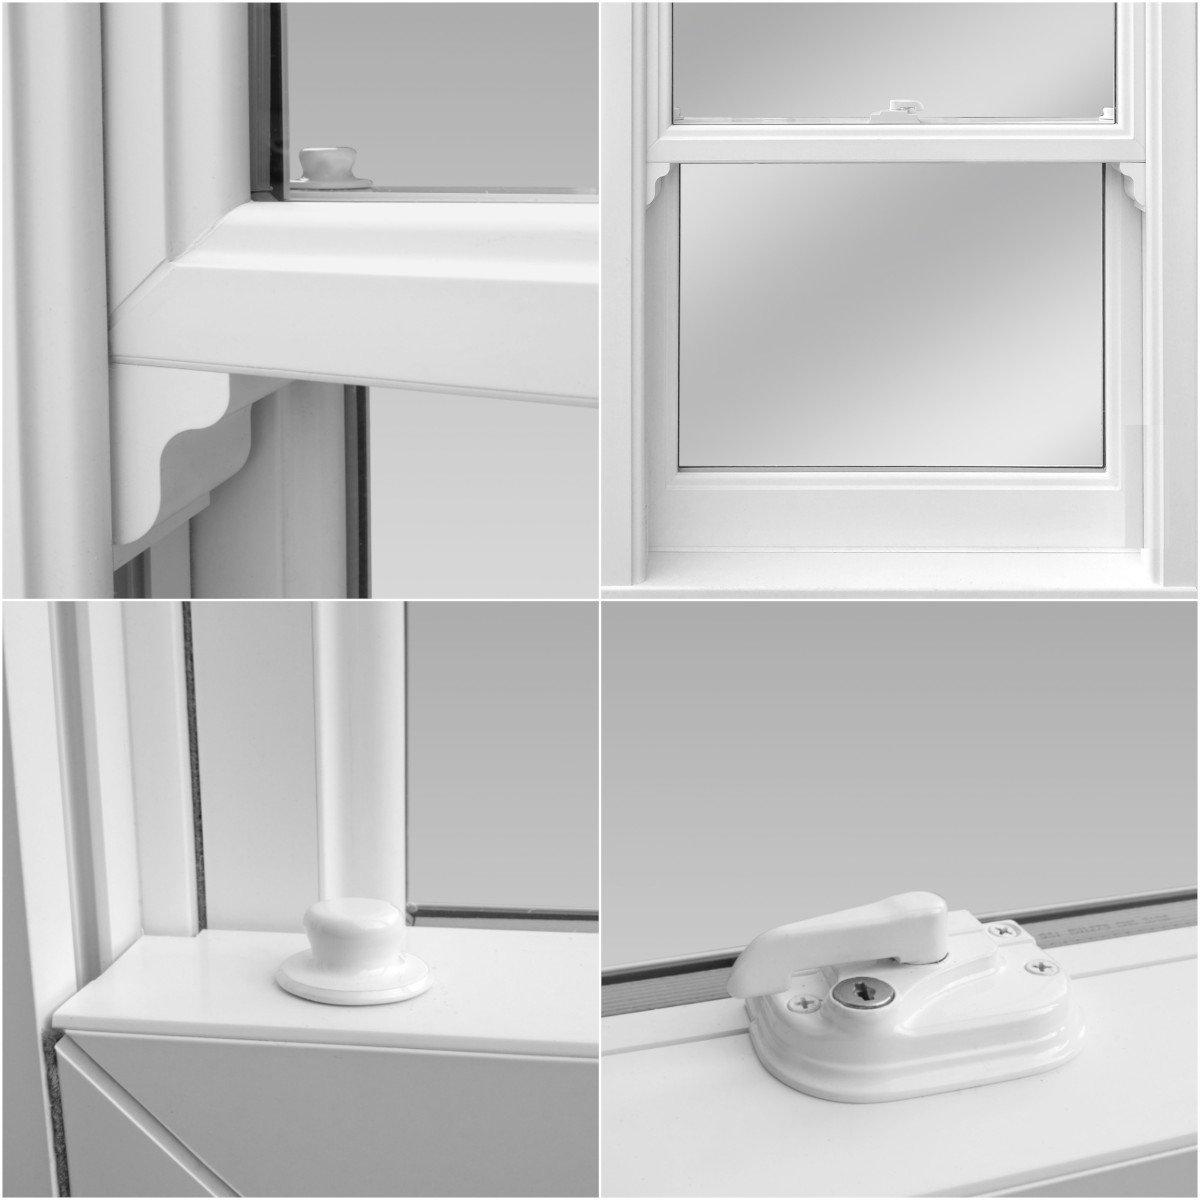 upvc sash windows features